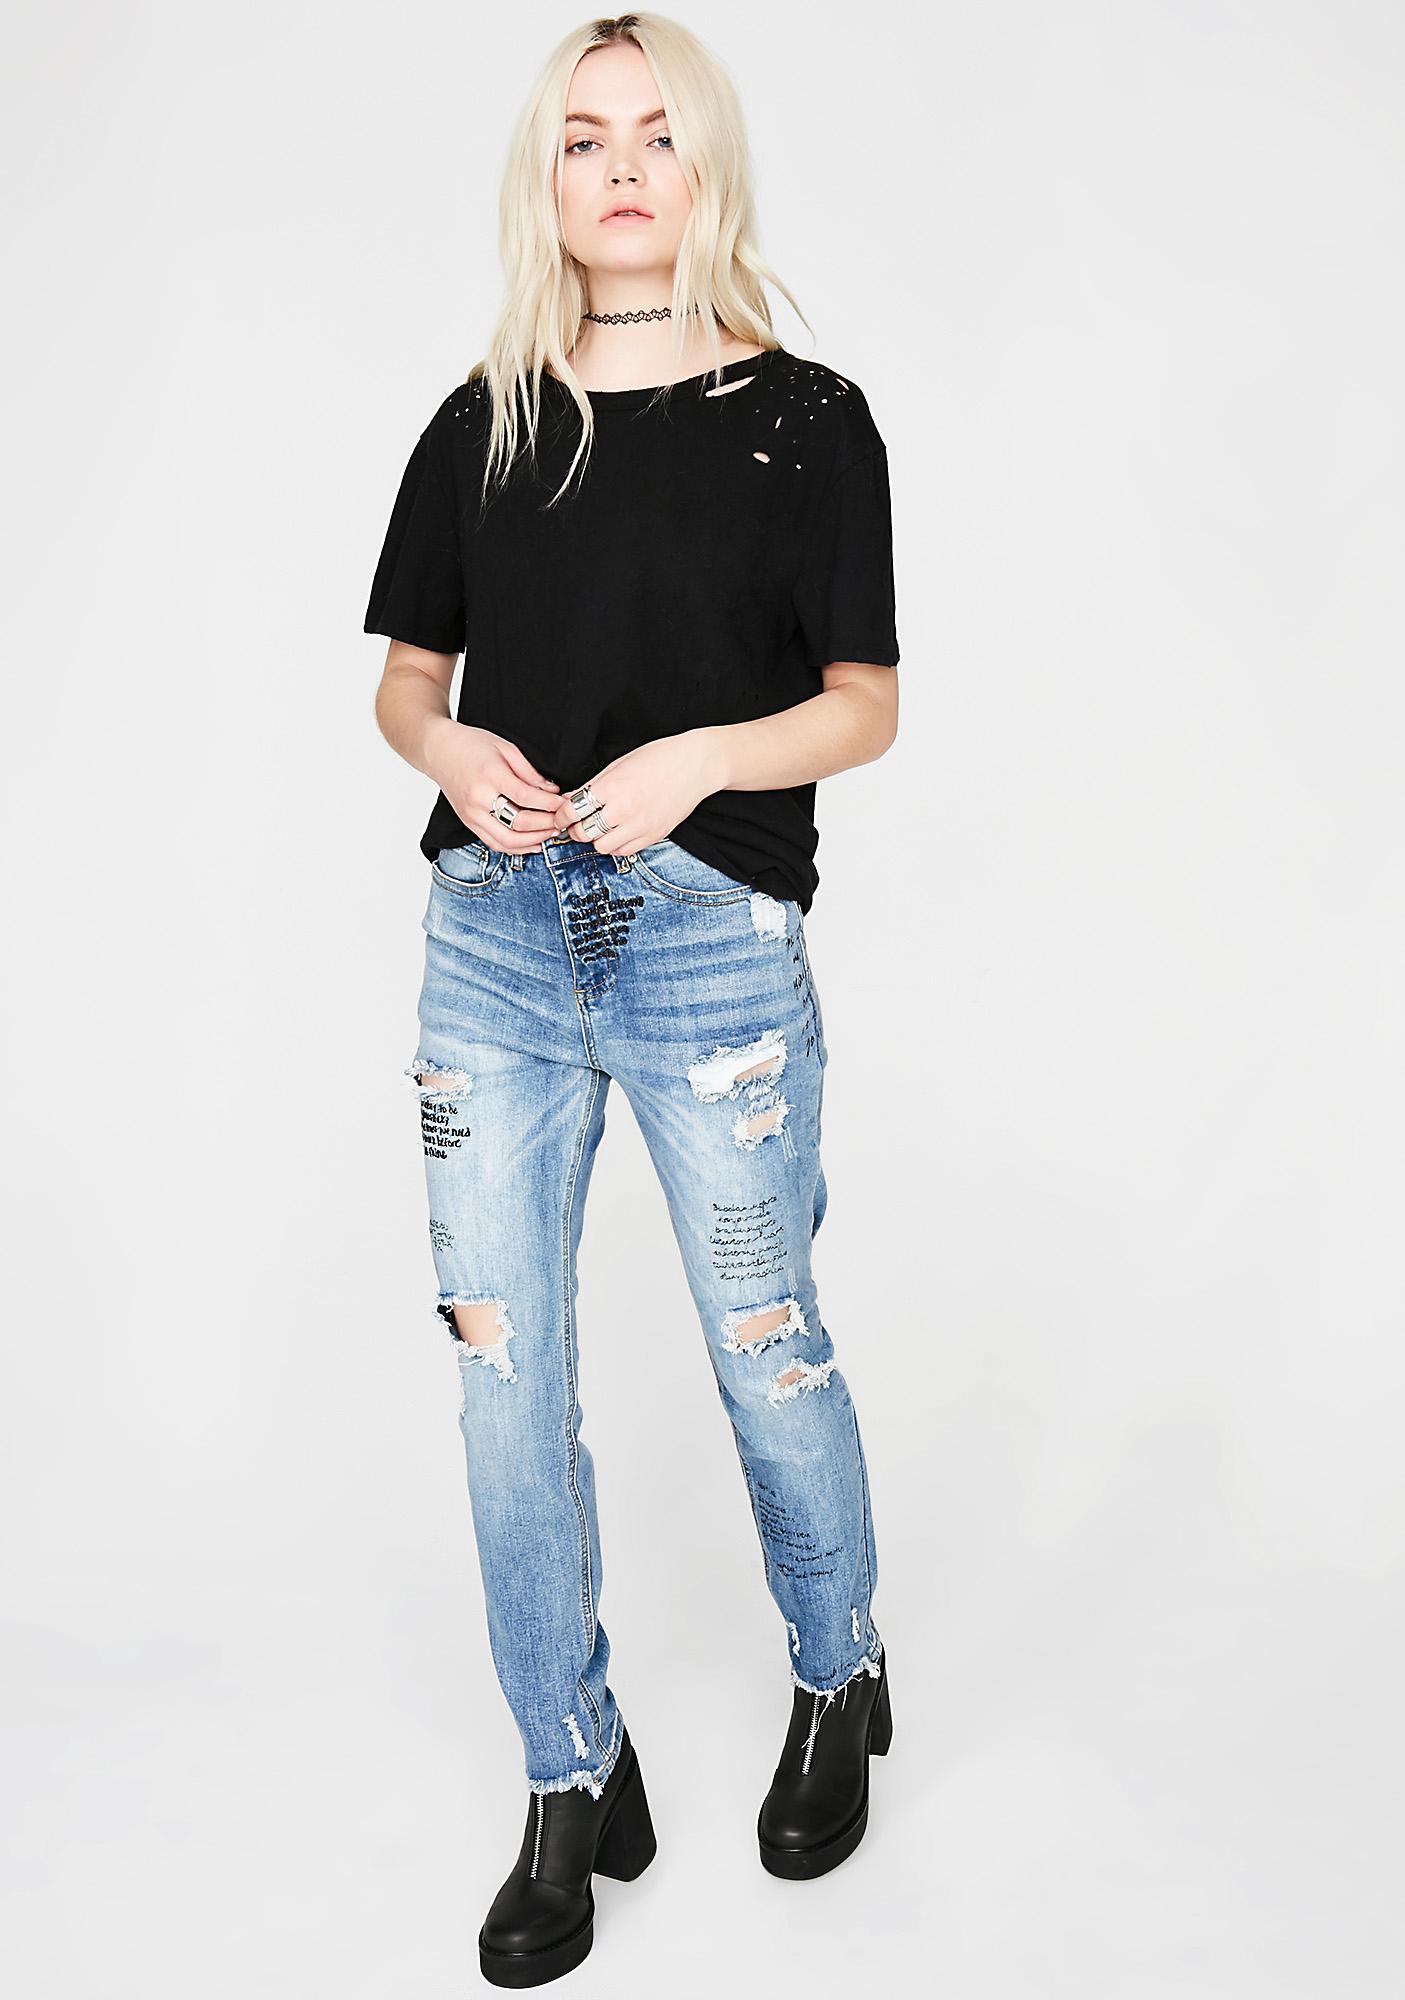 Take Notez Distressed Jeans